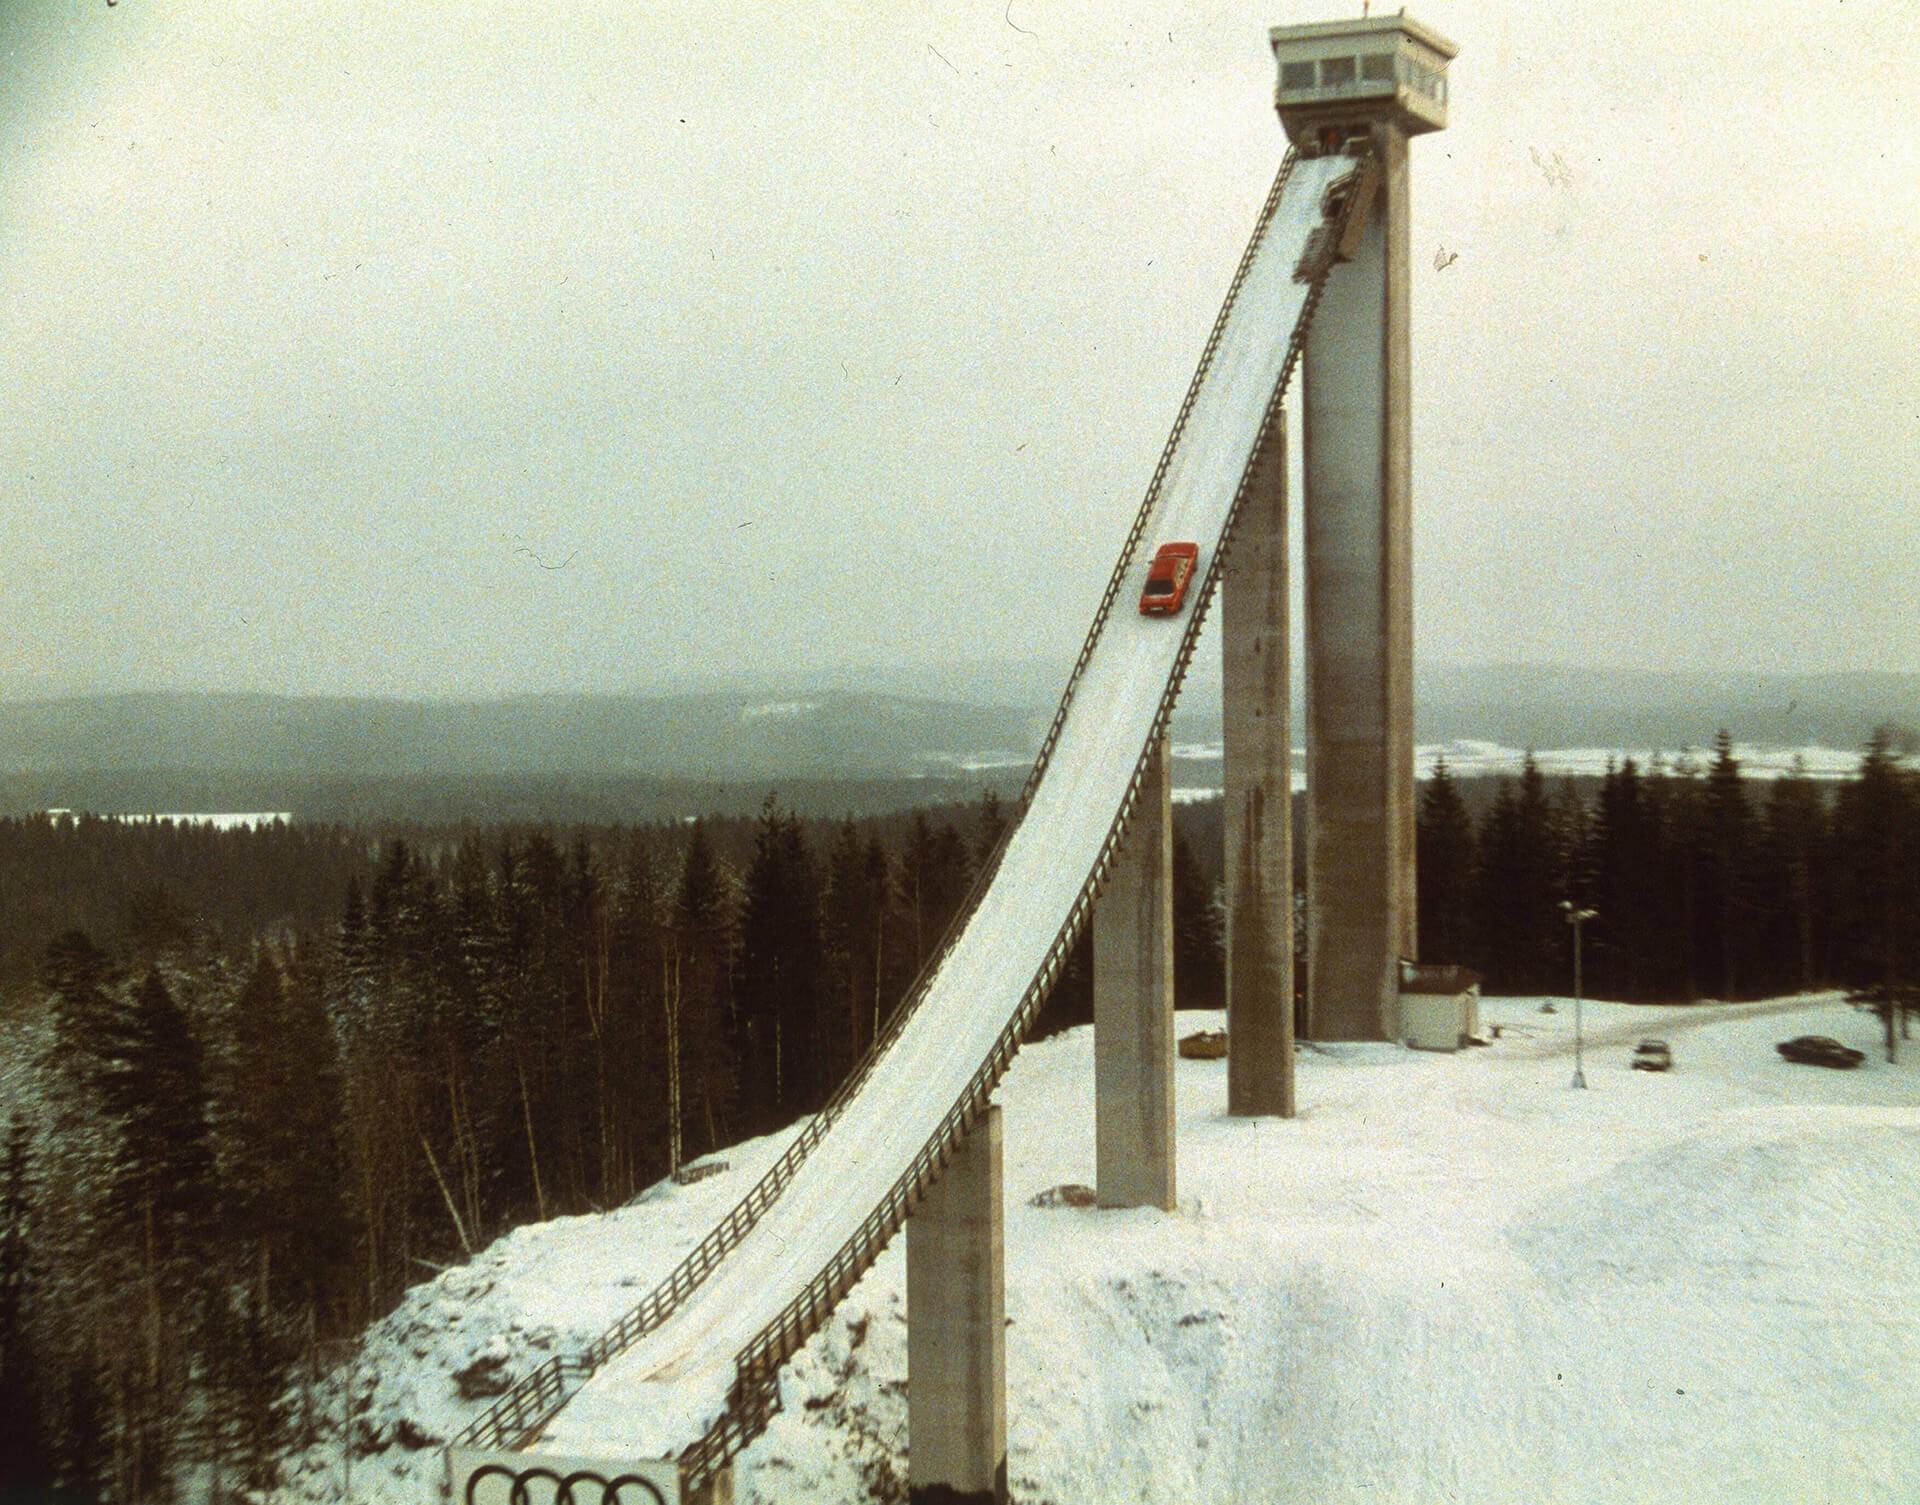 Audi quattro - 80% ήταν η κλίση του άλματος του σκι στο Kaipola της Φινλανδίας, όπου η Audi μαγνητοσκόπησε ένα θρυλικό διαφημιστικό το 1986